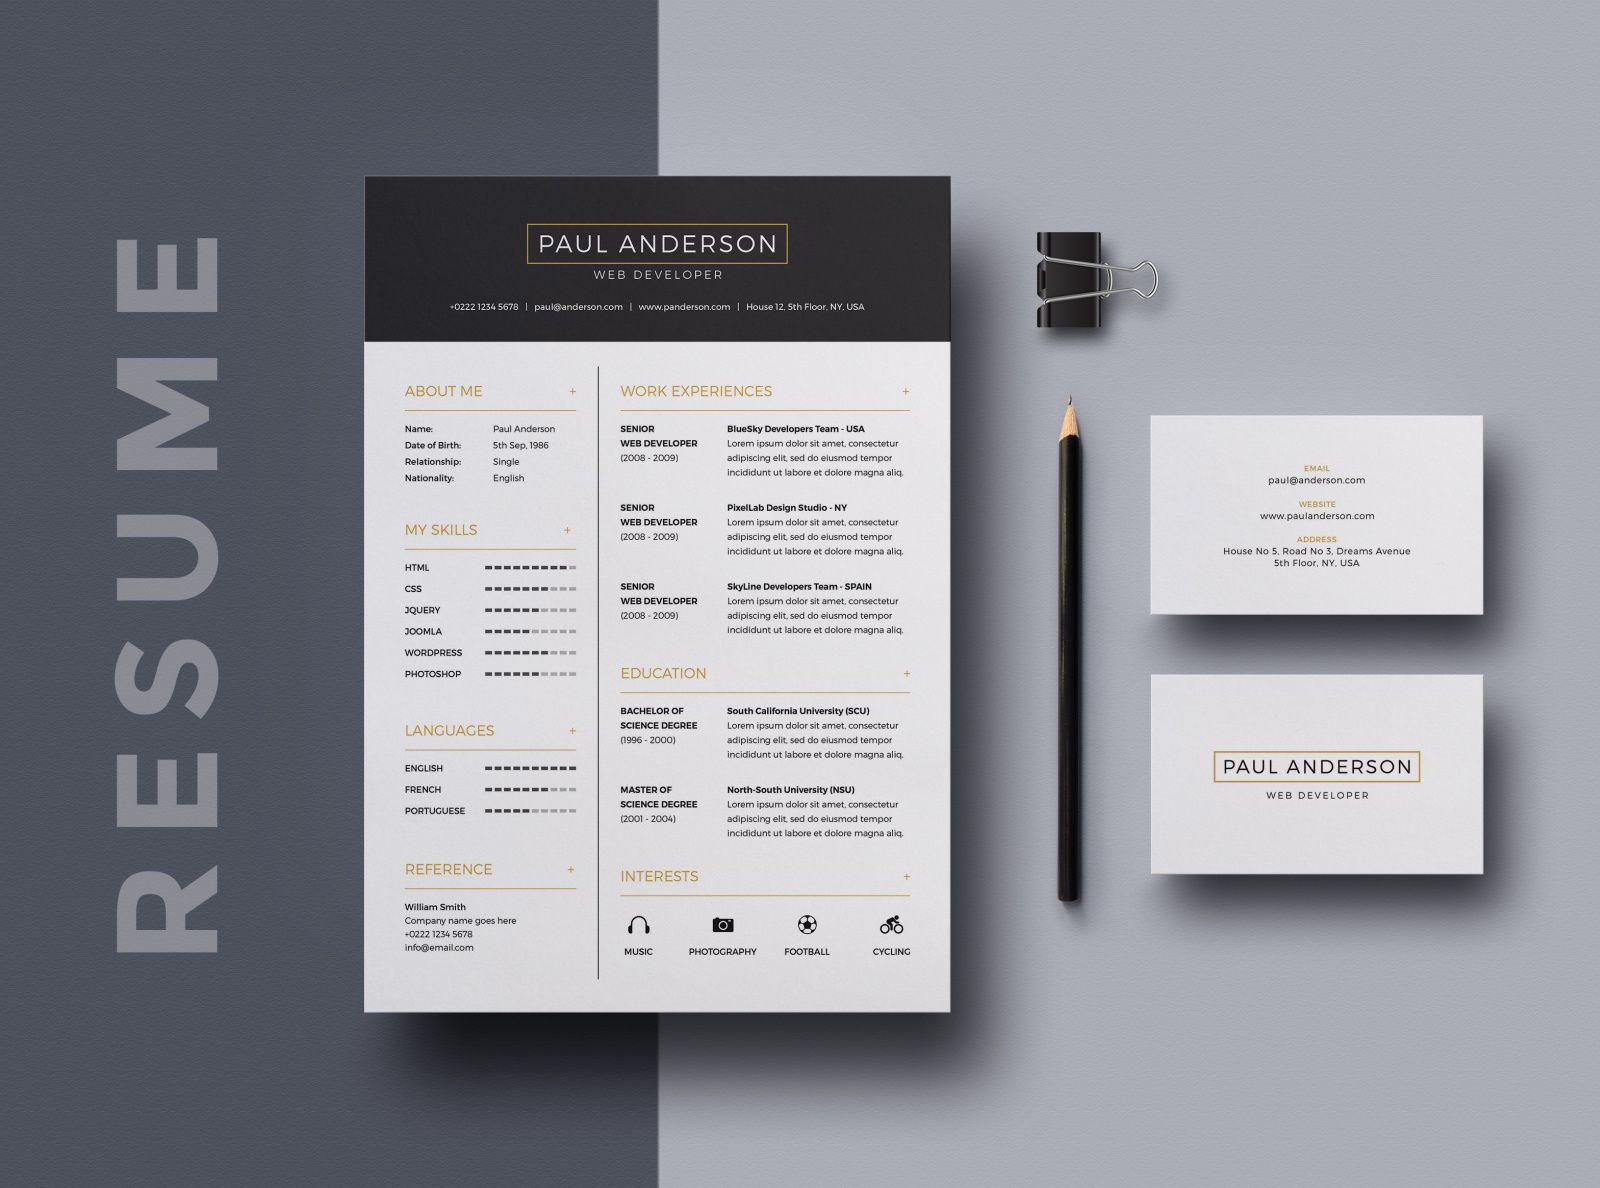 Resume Cv Bailey Resume Design Template Resume Design Creative